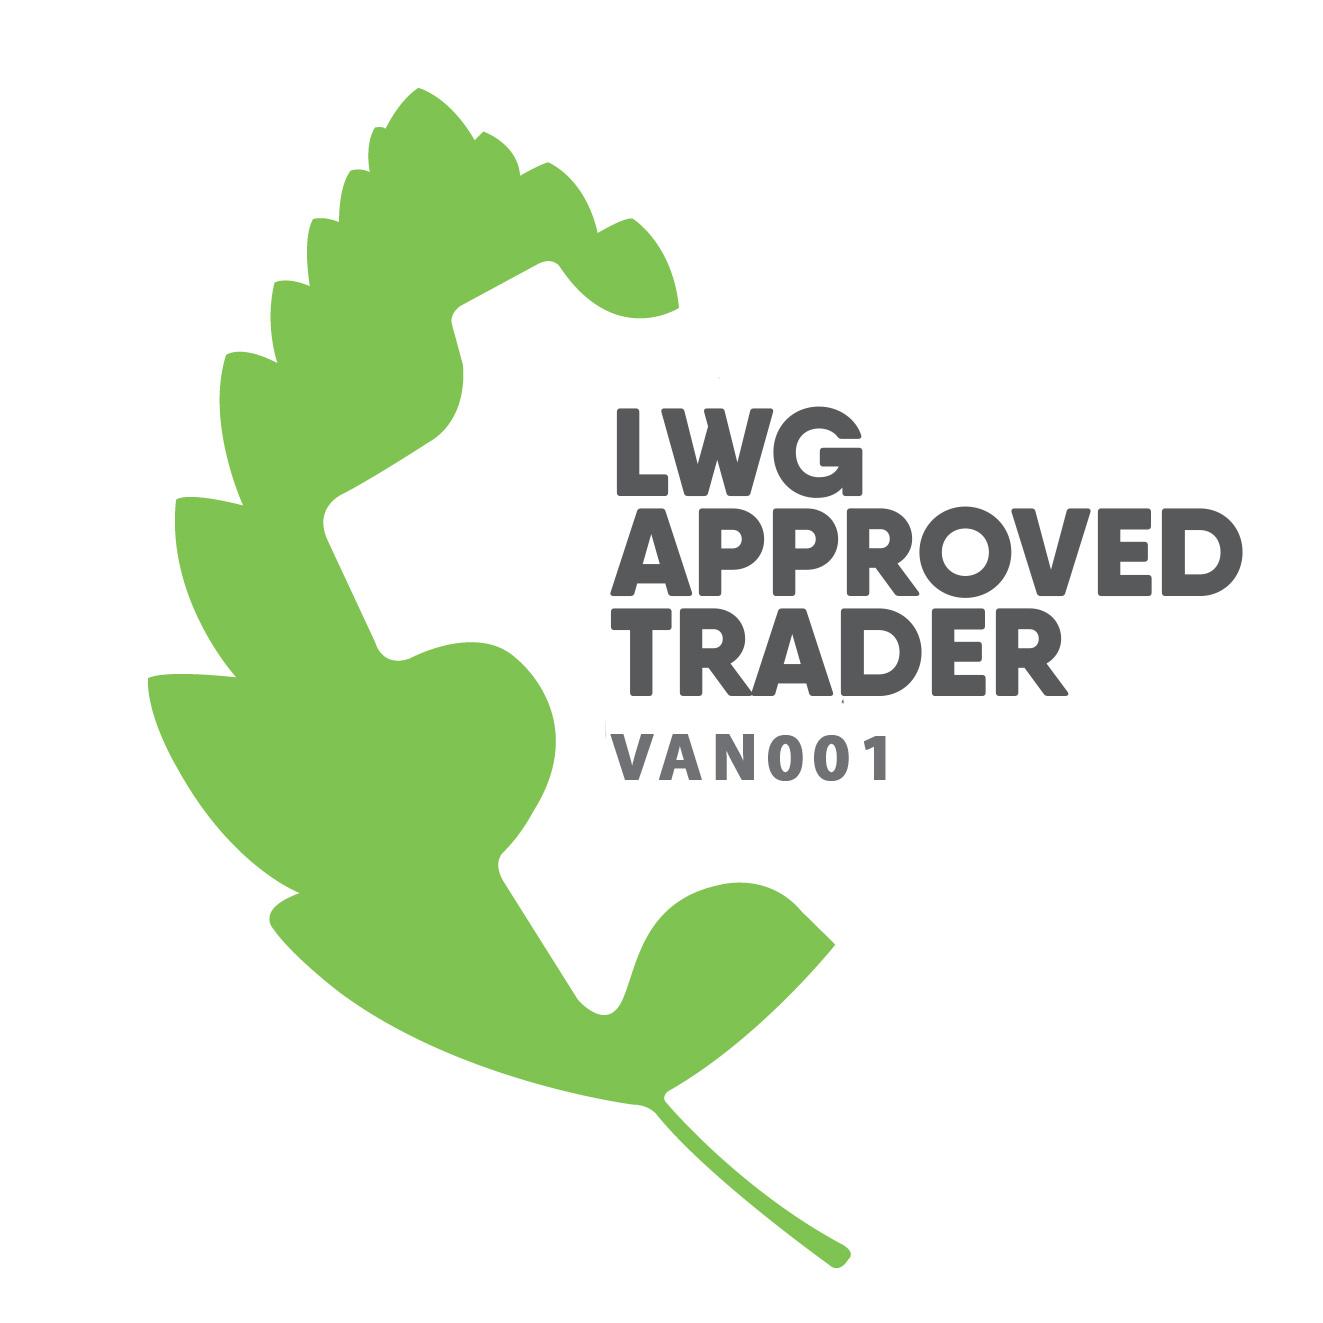 LWG Approved Trader